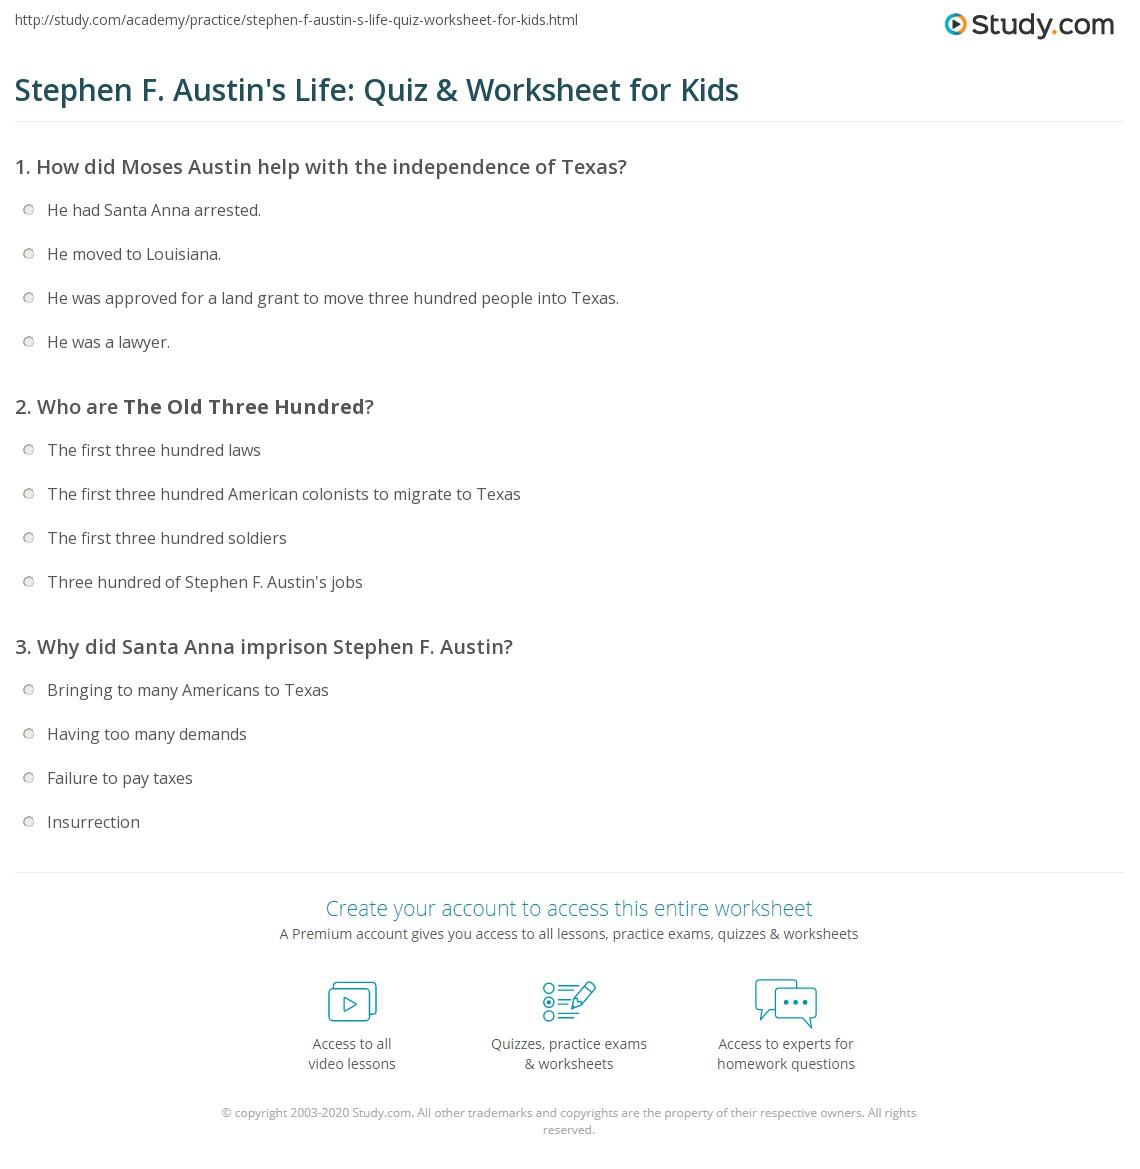 worksheet Stephen F Austin Facts stephen f austins life quiz worksheet for kids study com print austin lesson facts biography worksheet